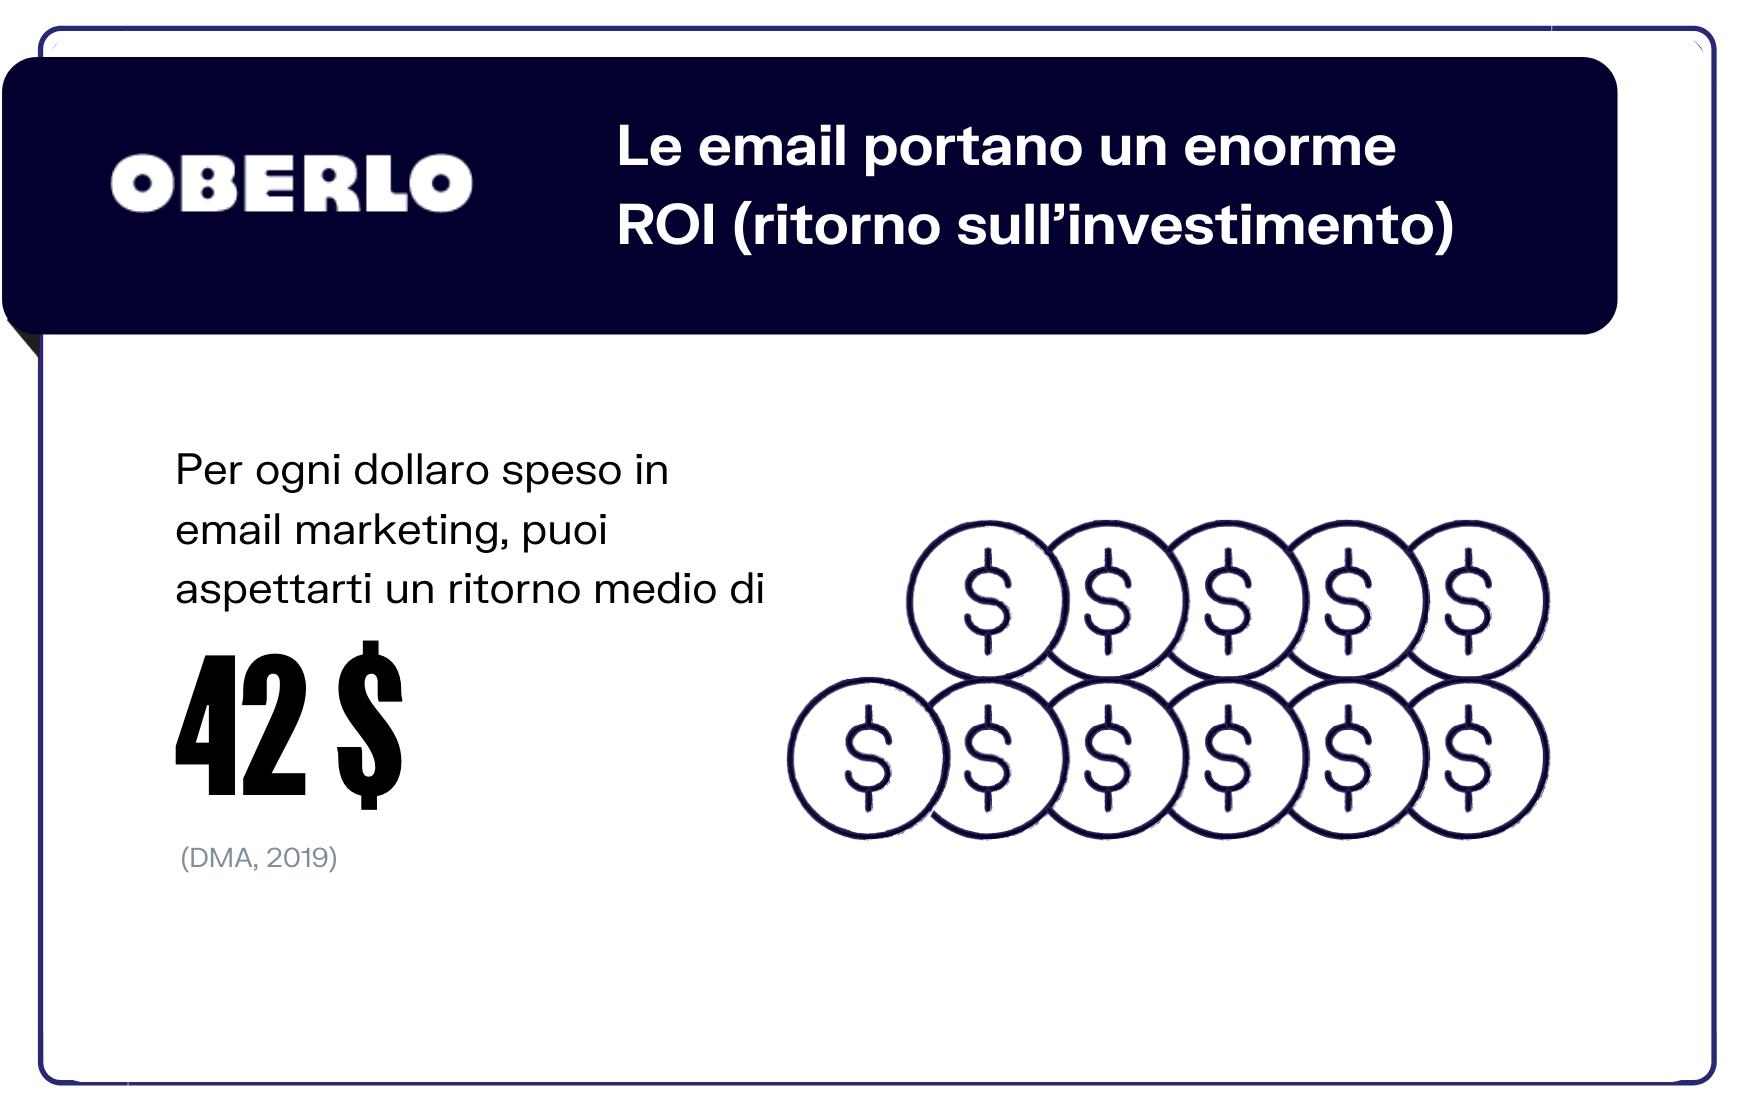 statistiche email marketing roi